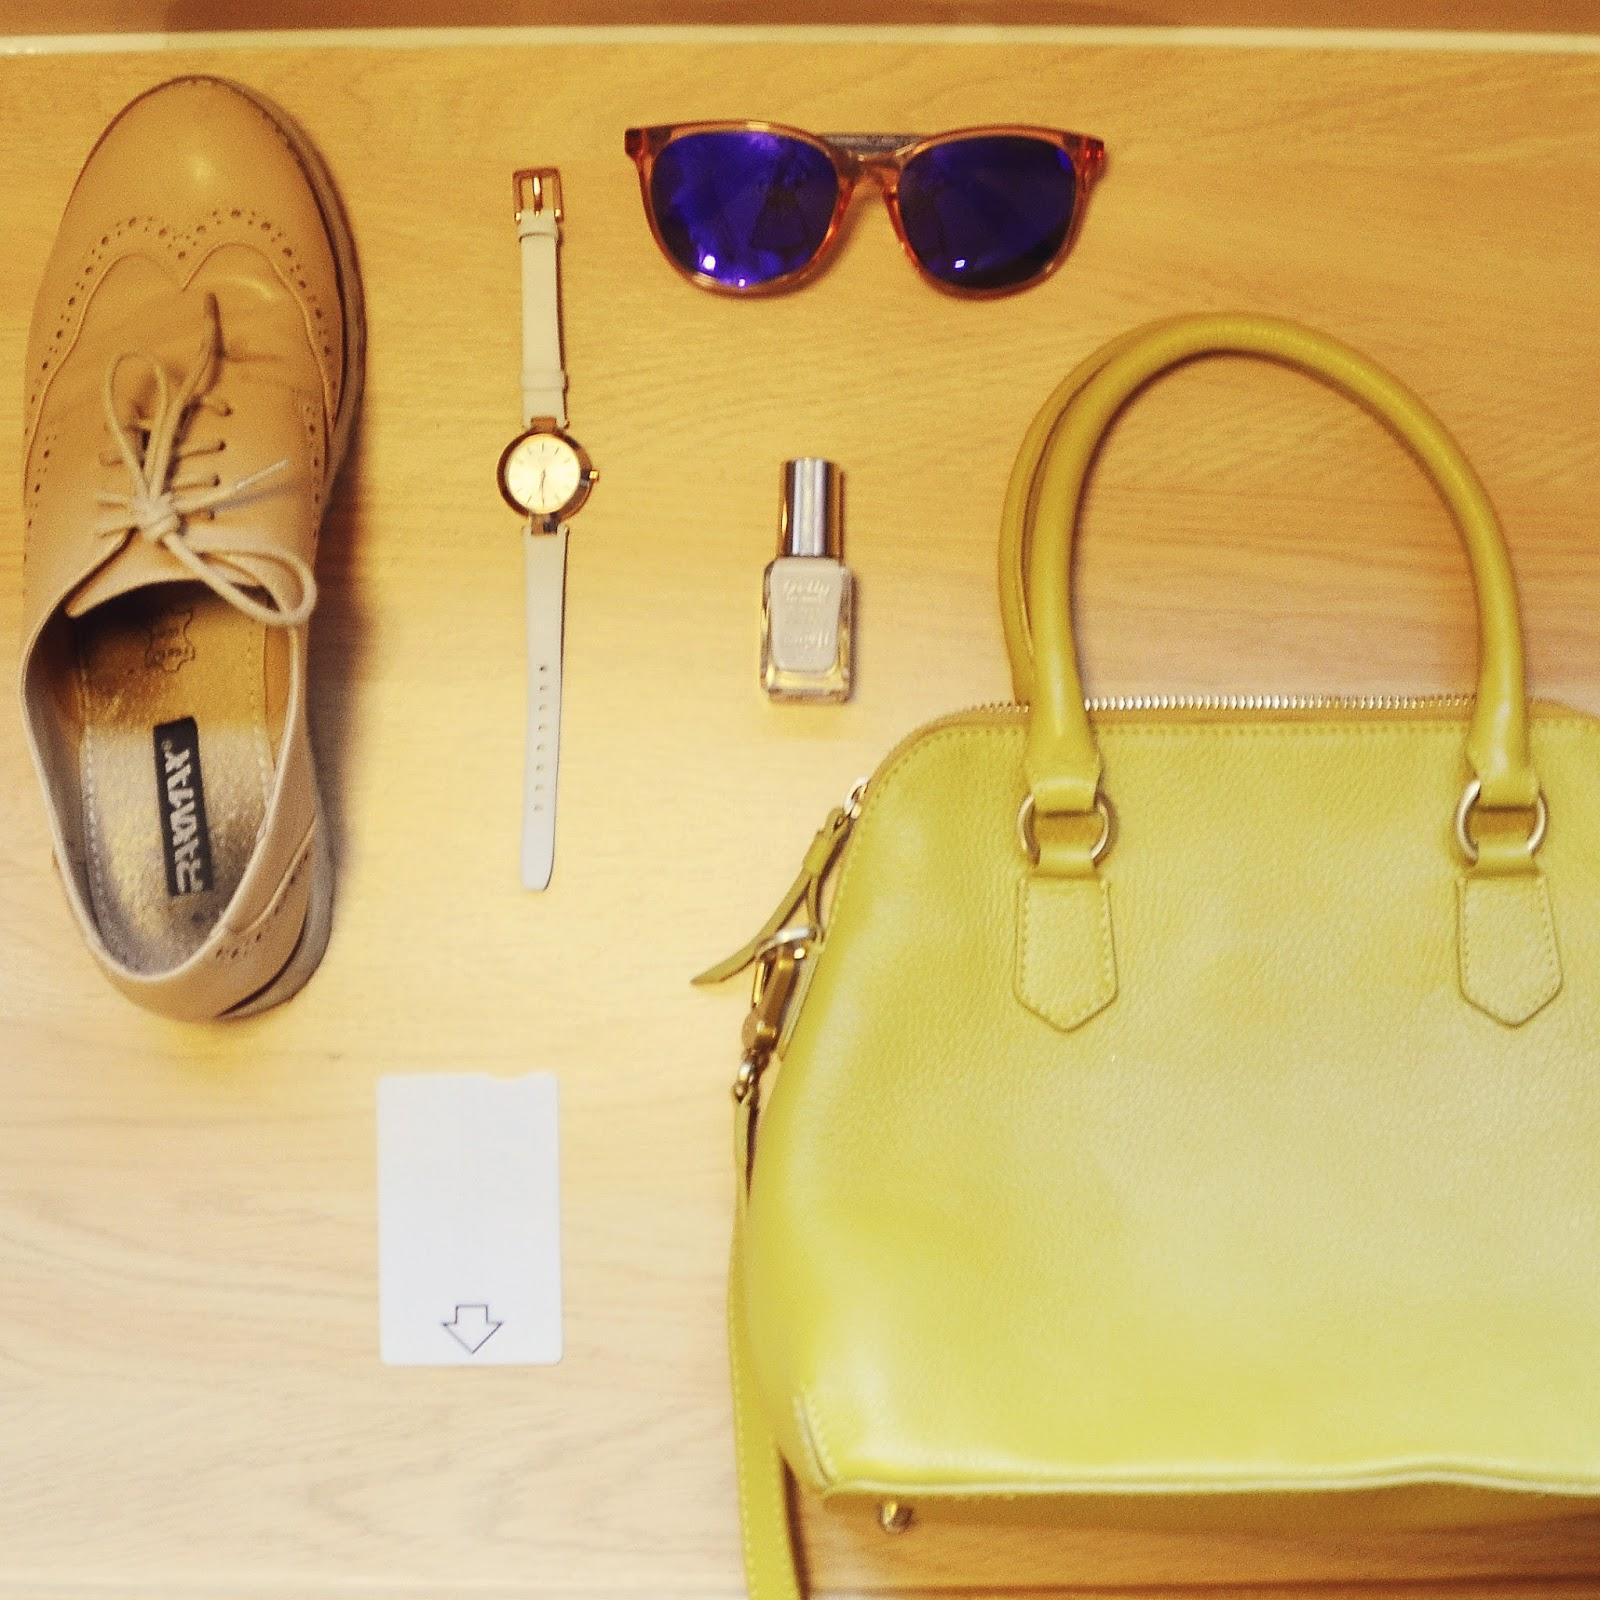 flatlay, carrera sunglasses, style edit brogue, boden yellow bag, travelodge room key card, dkny watch